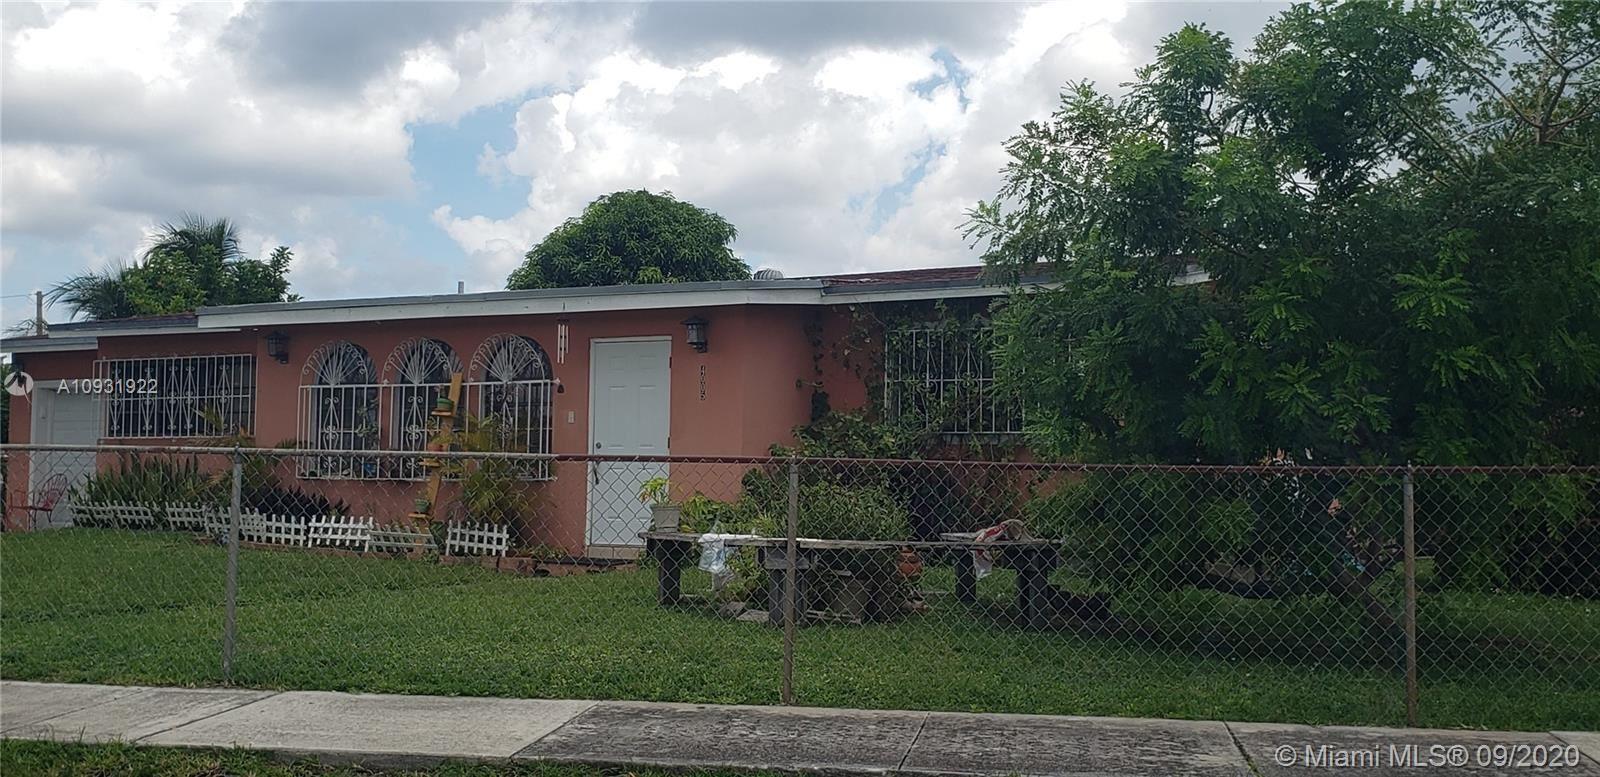 4005 NW 196th St, Miami Gardens, FL 33055 - #: A10931922